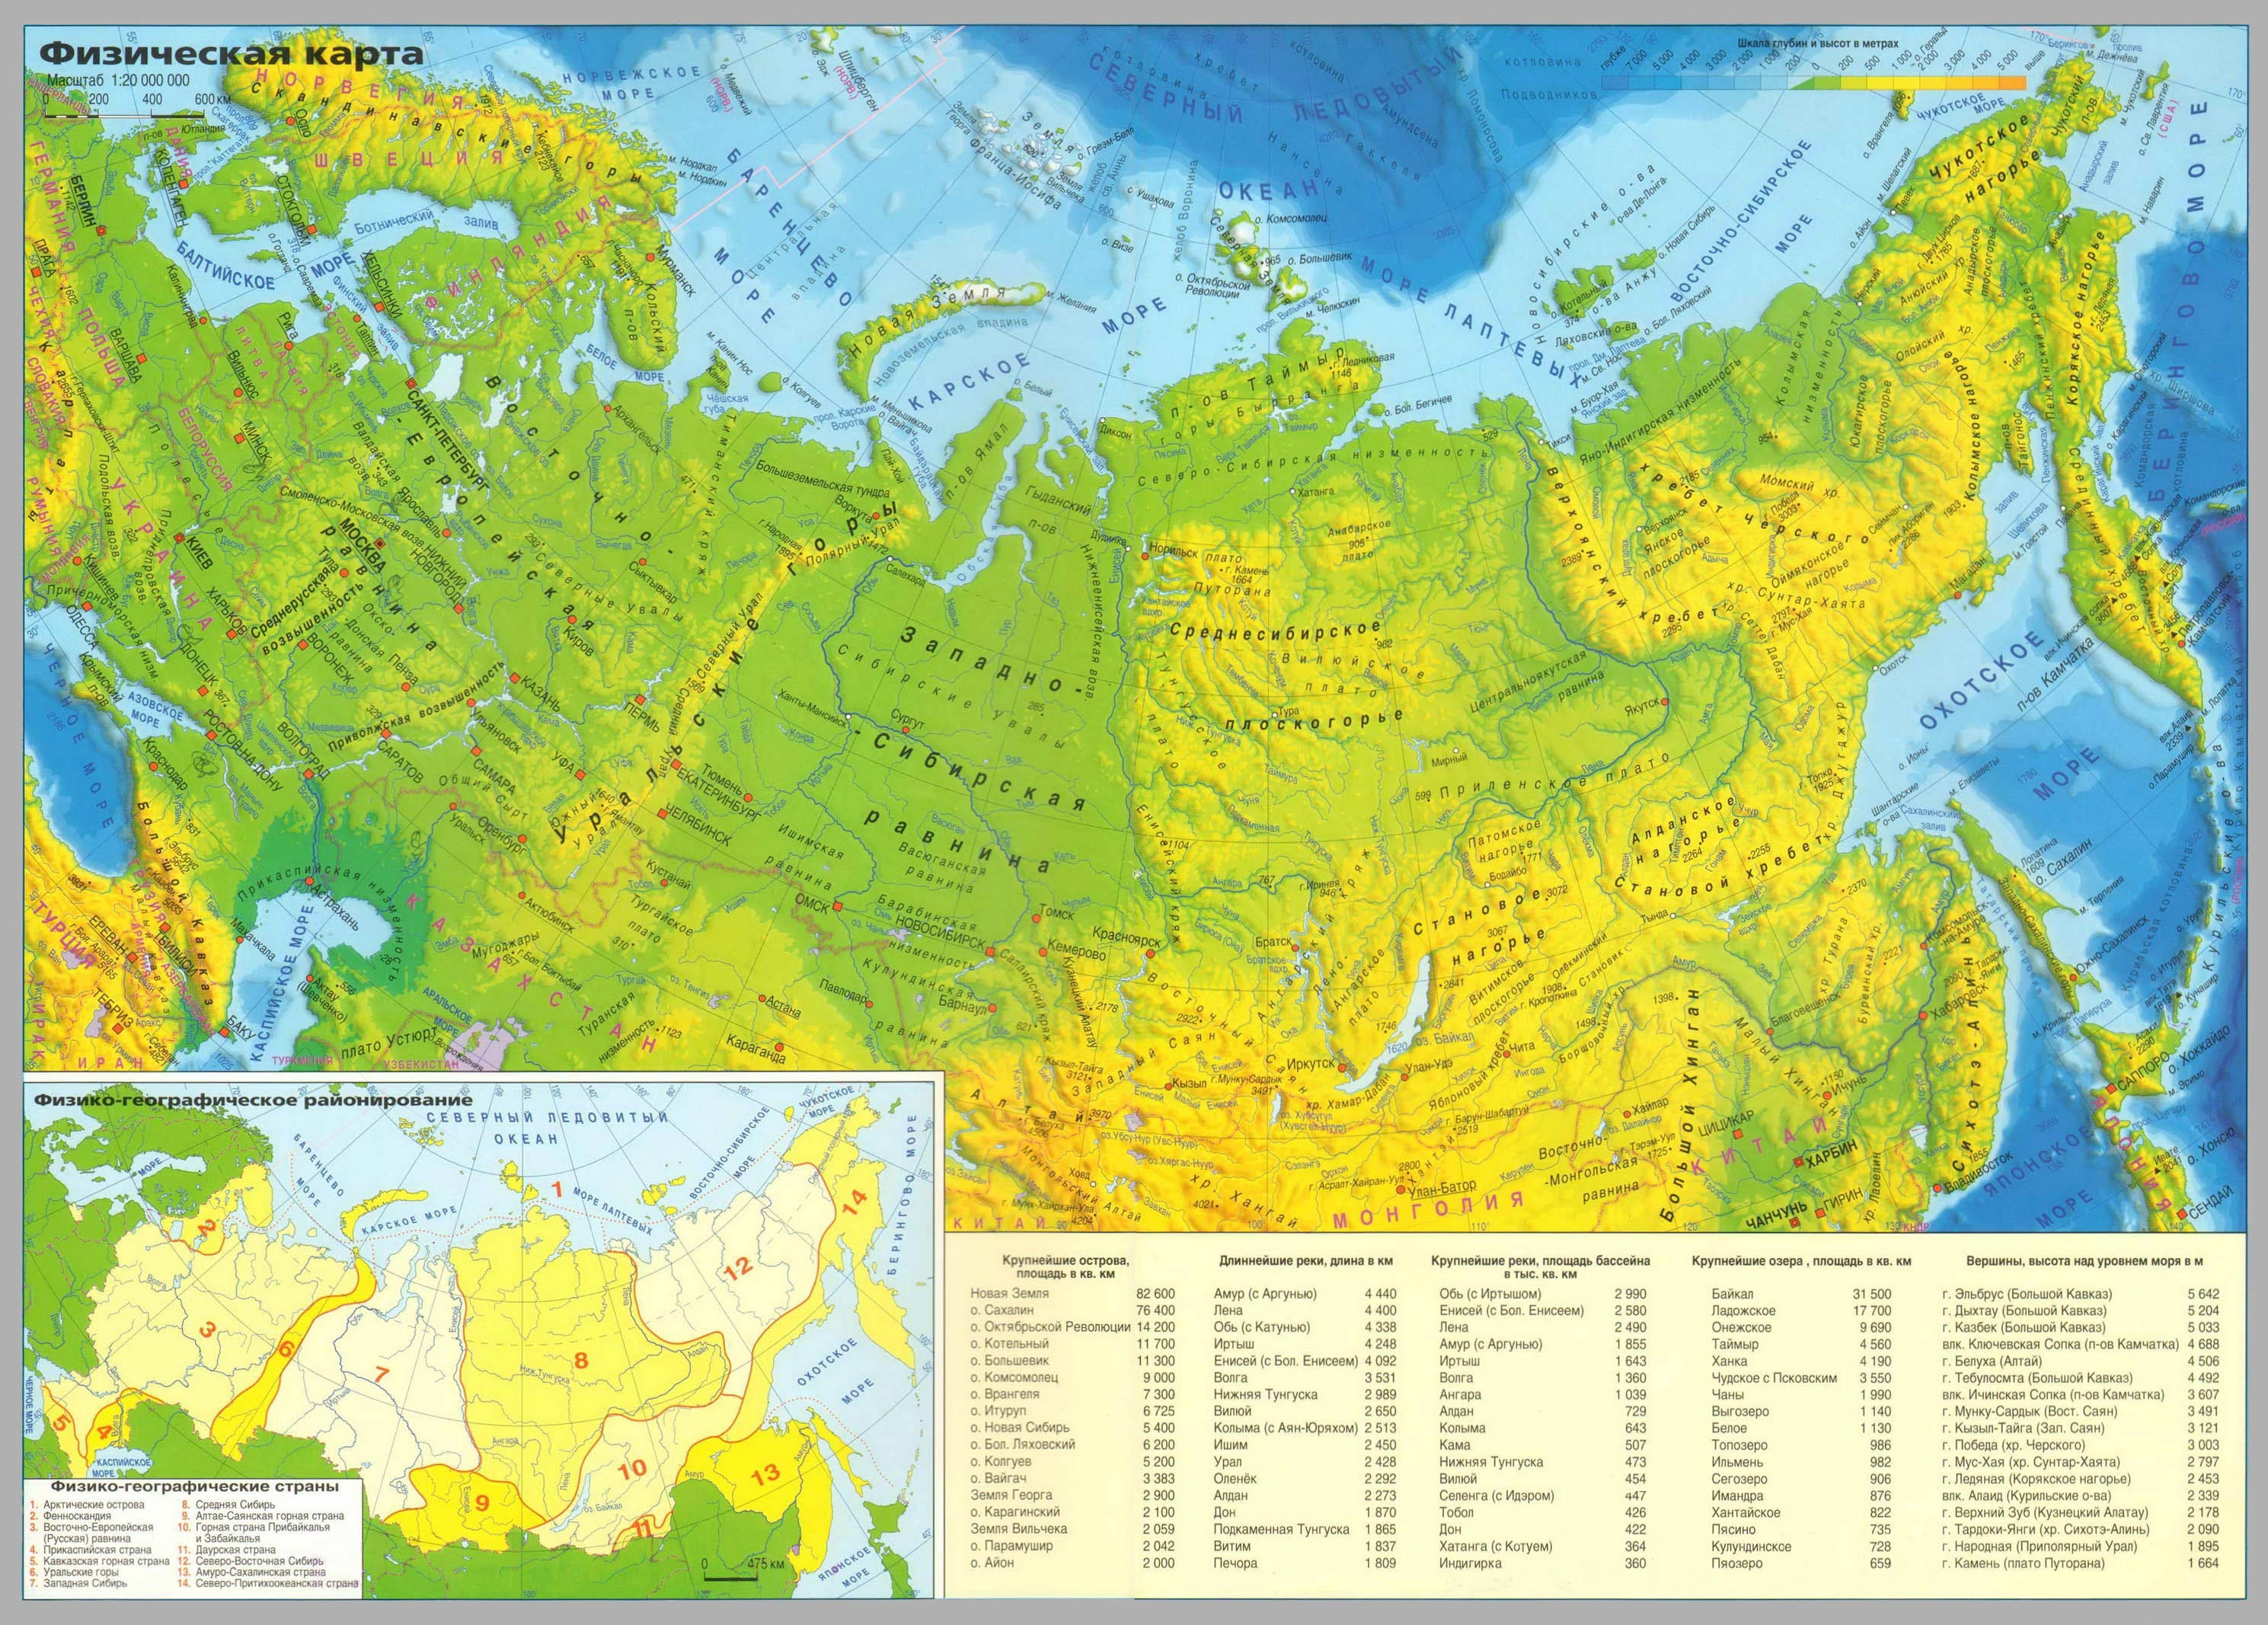 http://www.traveler-mir.com/files/maps/1/1/karta-rossii-s-gorodami.jpg